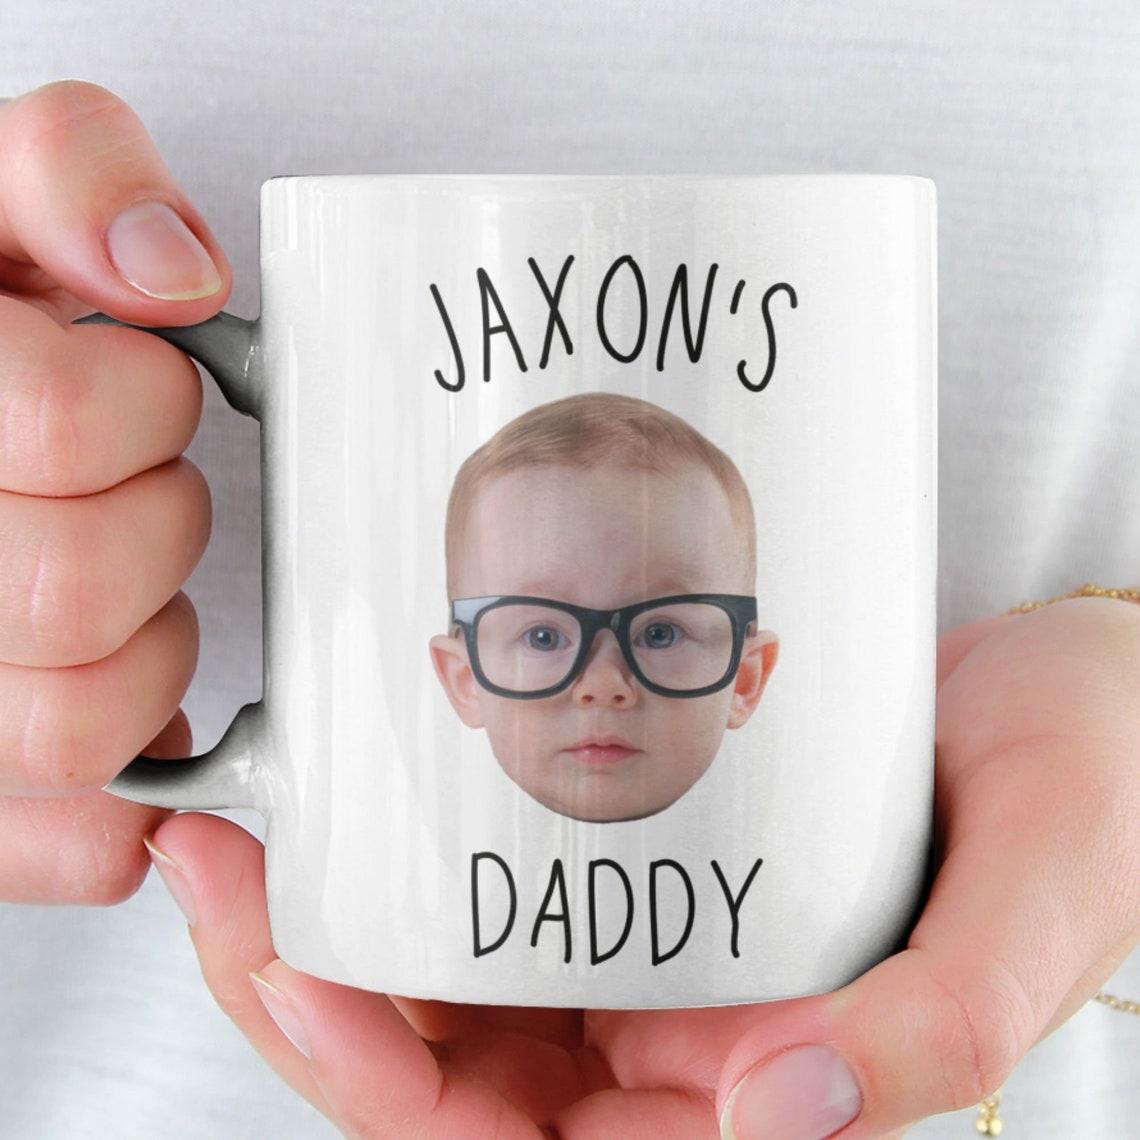 Custom Baby Face Mug / Baby Face Coffee Mug / Personalized image 0; father's day gift ideas